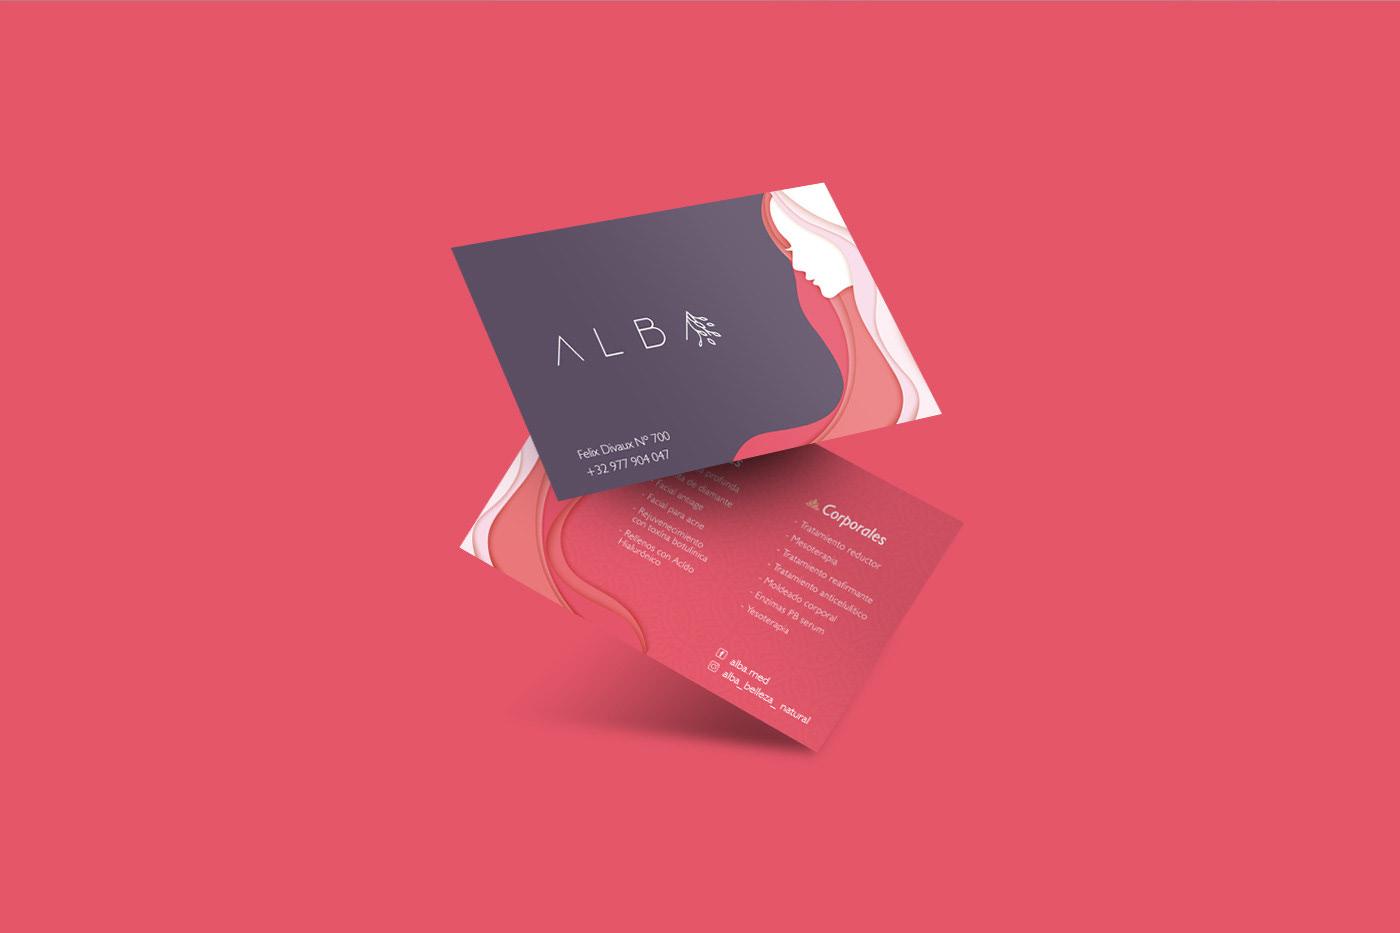 brand design for alba made by tony hall